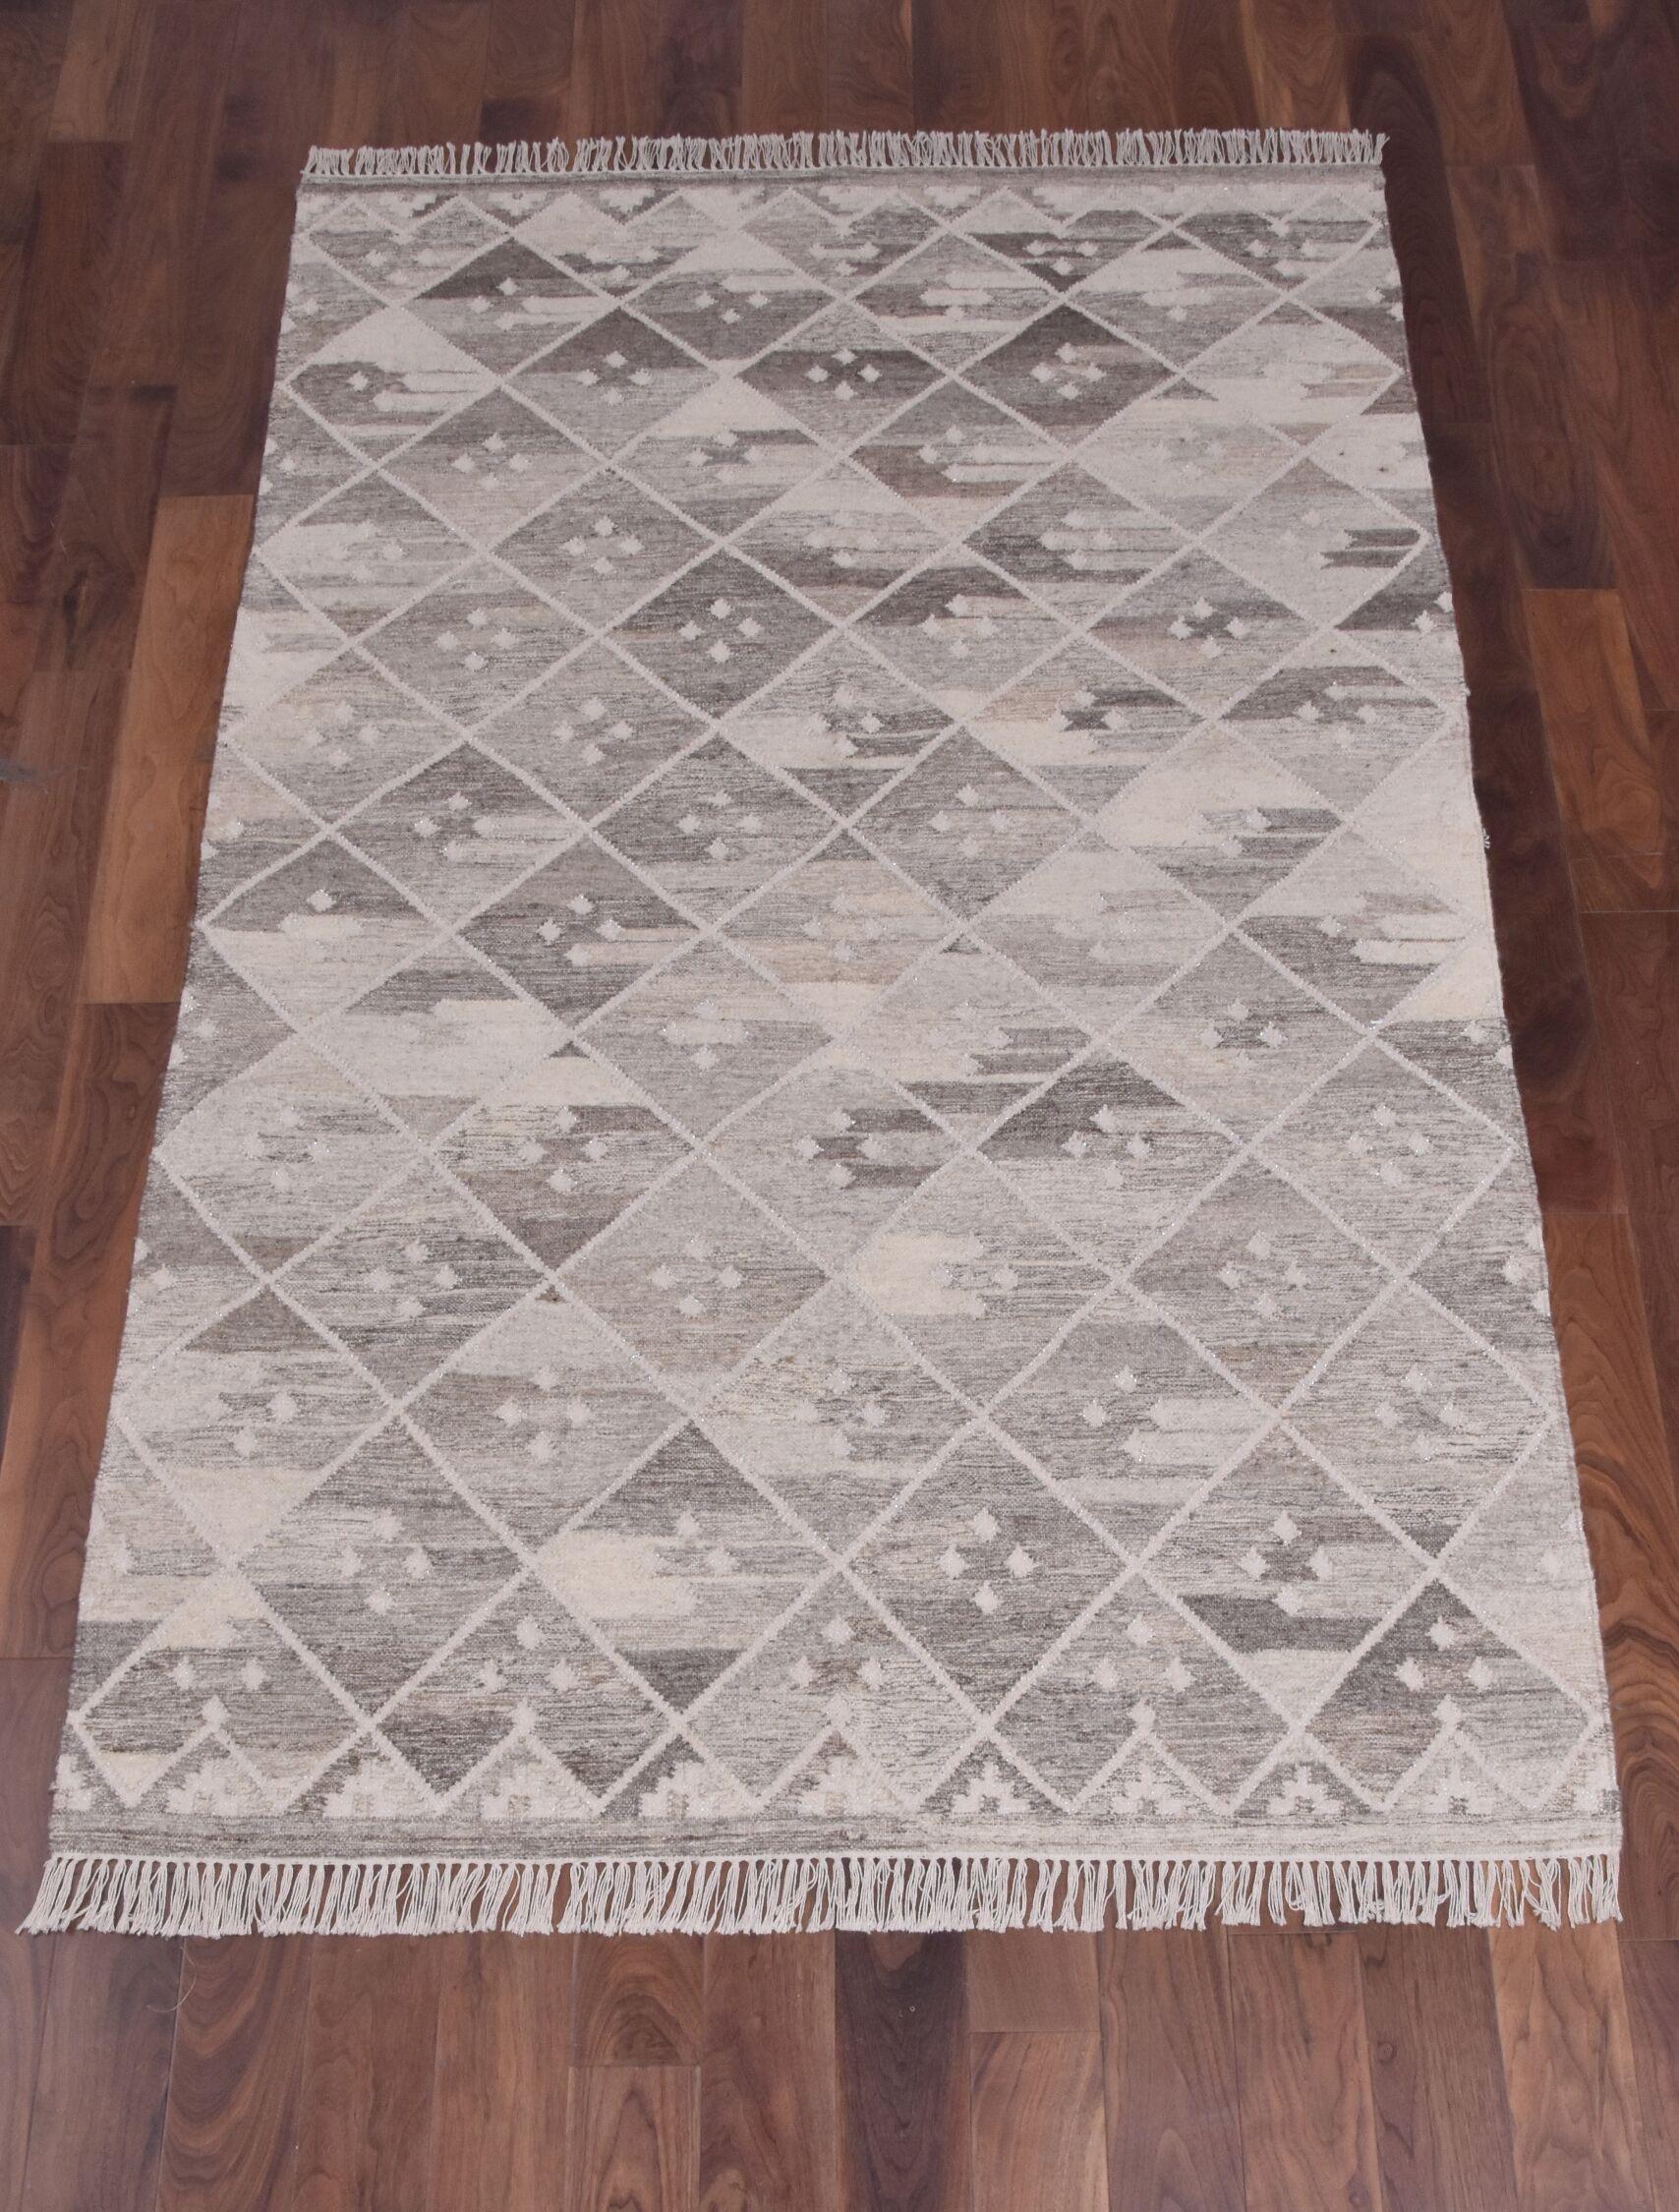 Berwick Hand-Woven Wool Gray Area Rug Rug Size: Rectangle 5' x 8'